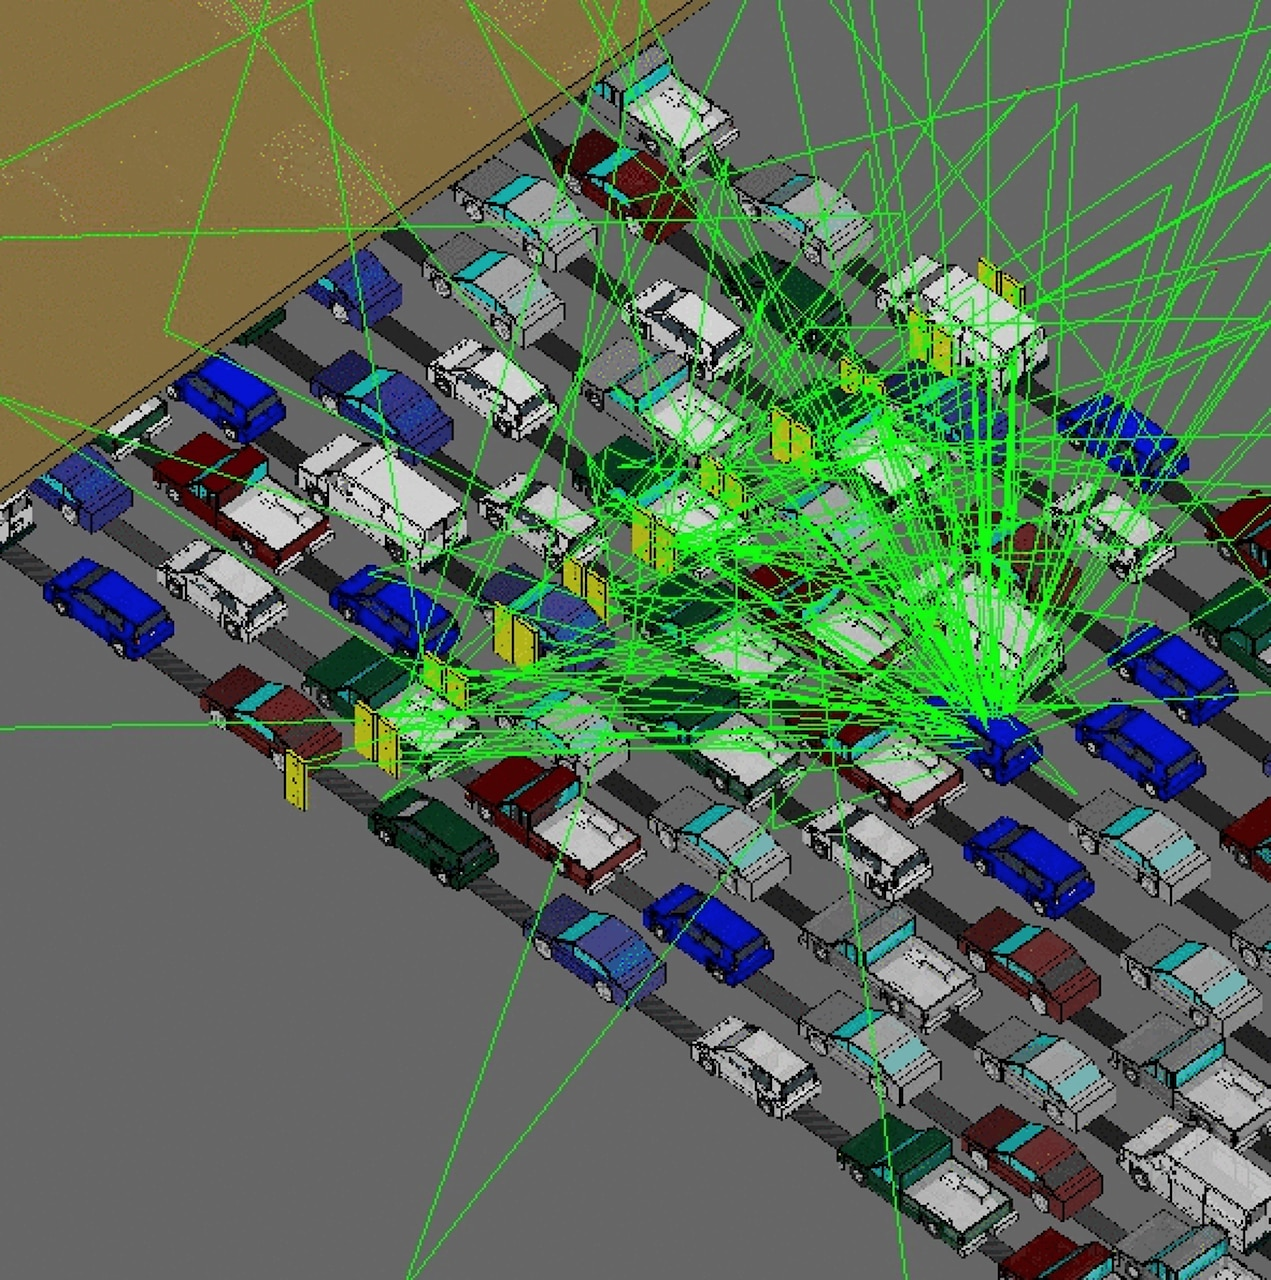 SoftWare for Optimization of Radiation Detectors (SWORD)